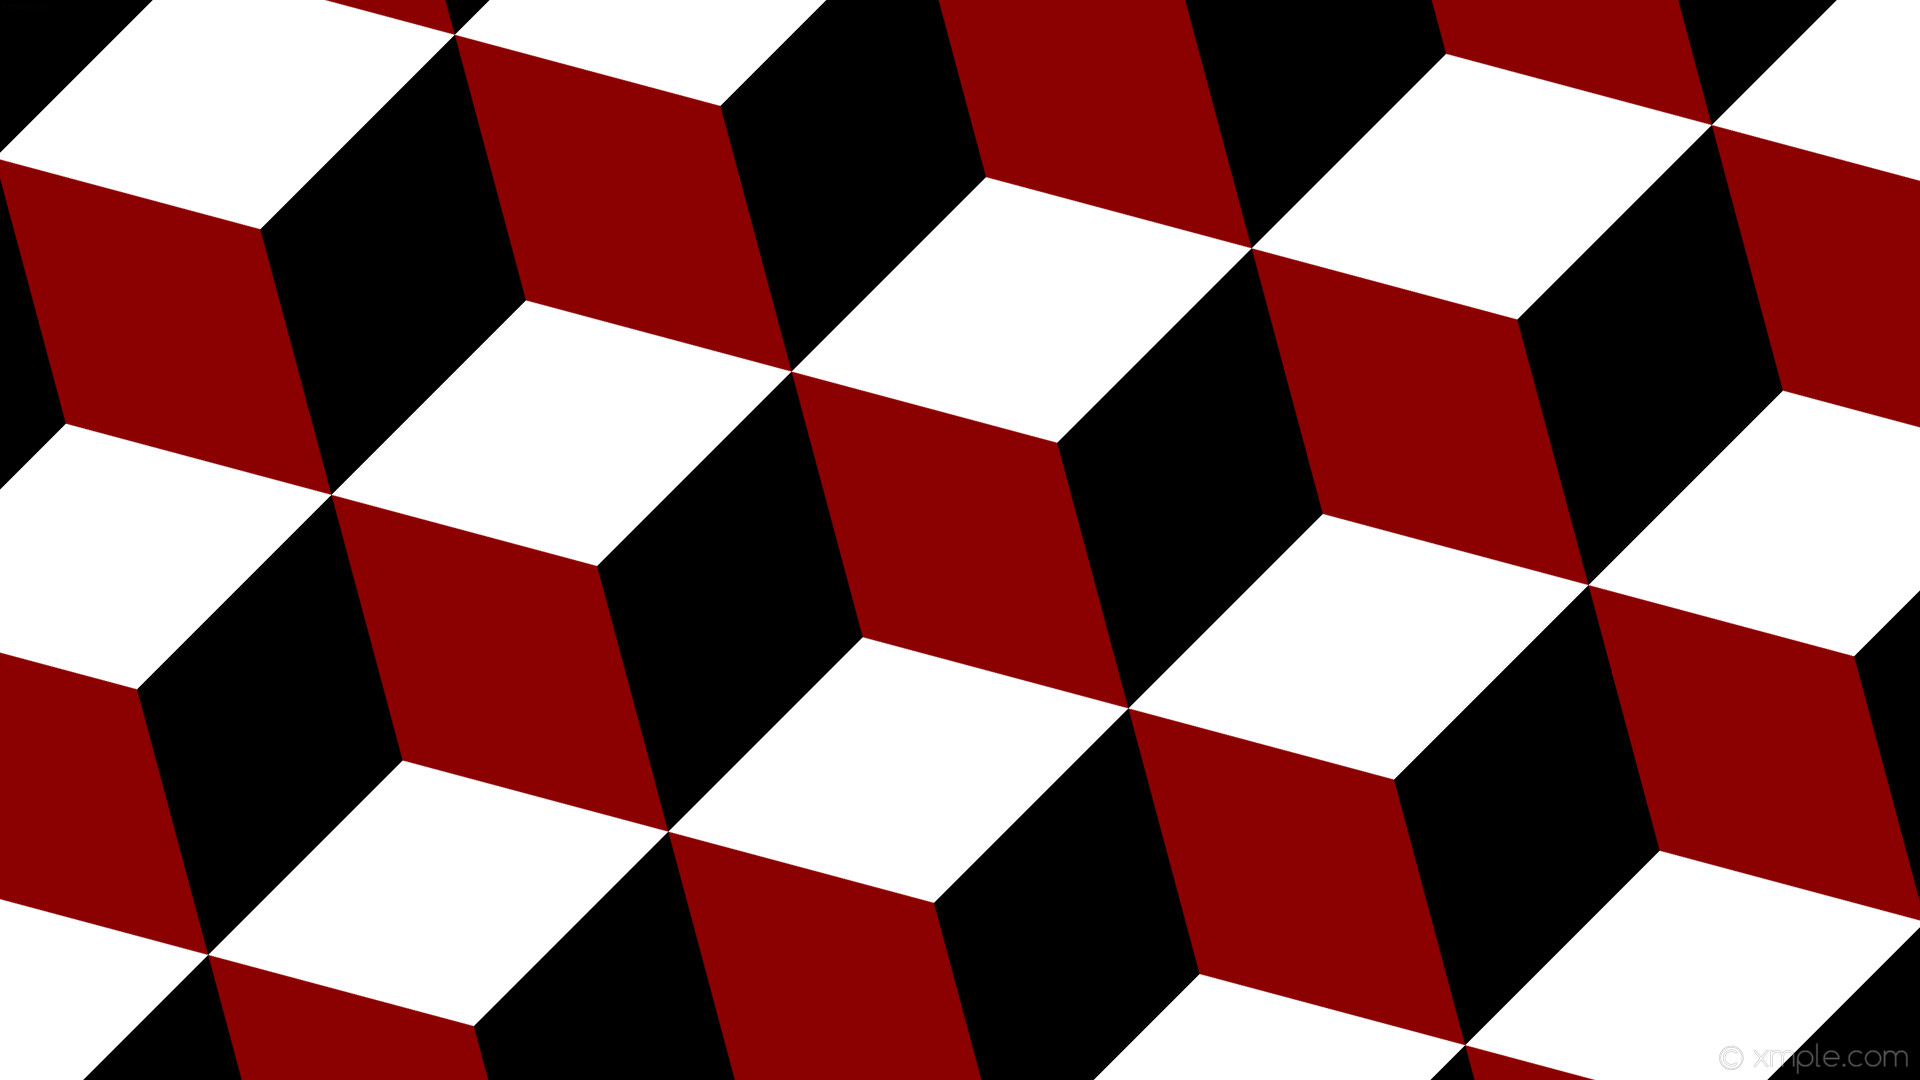 wallpaper red 3d cubes black white dark red #8b0000 #000000 #ffffff 135°